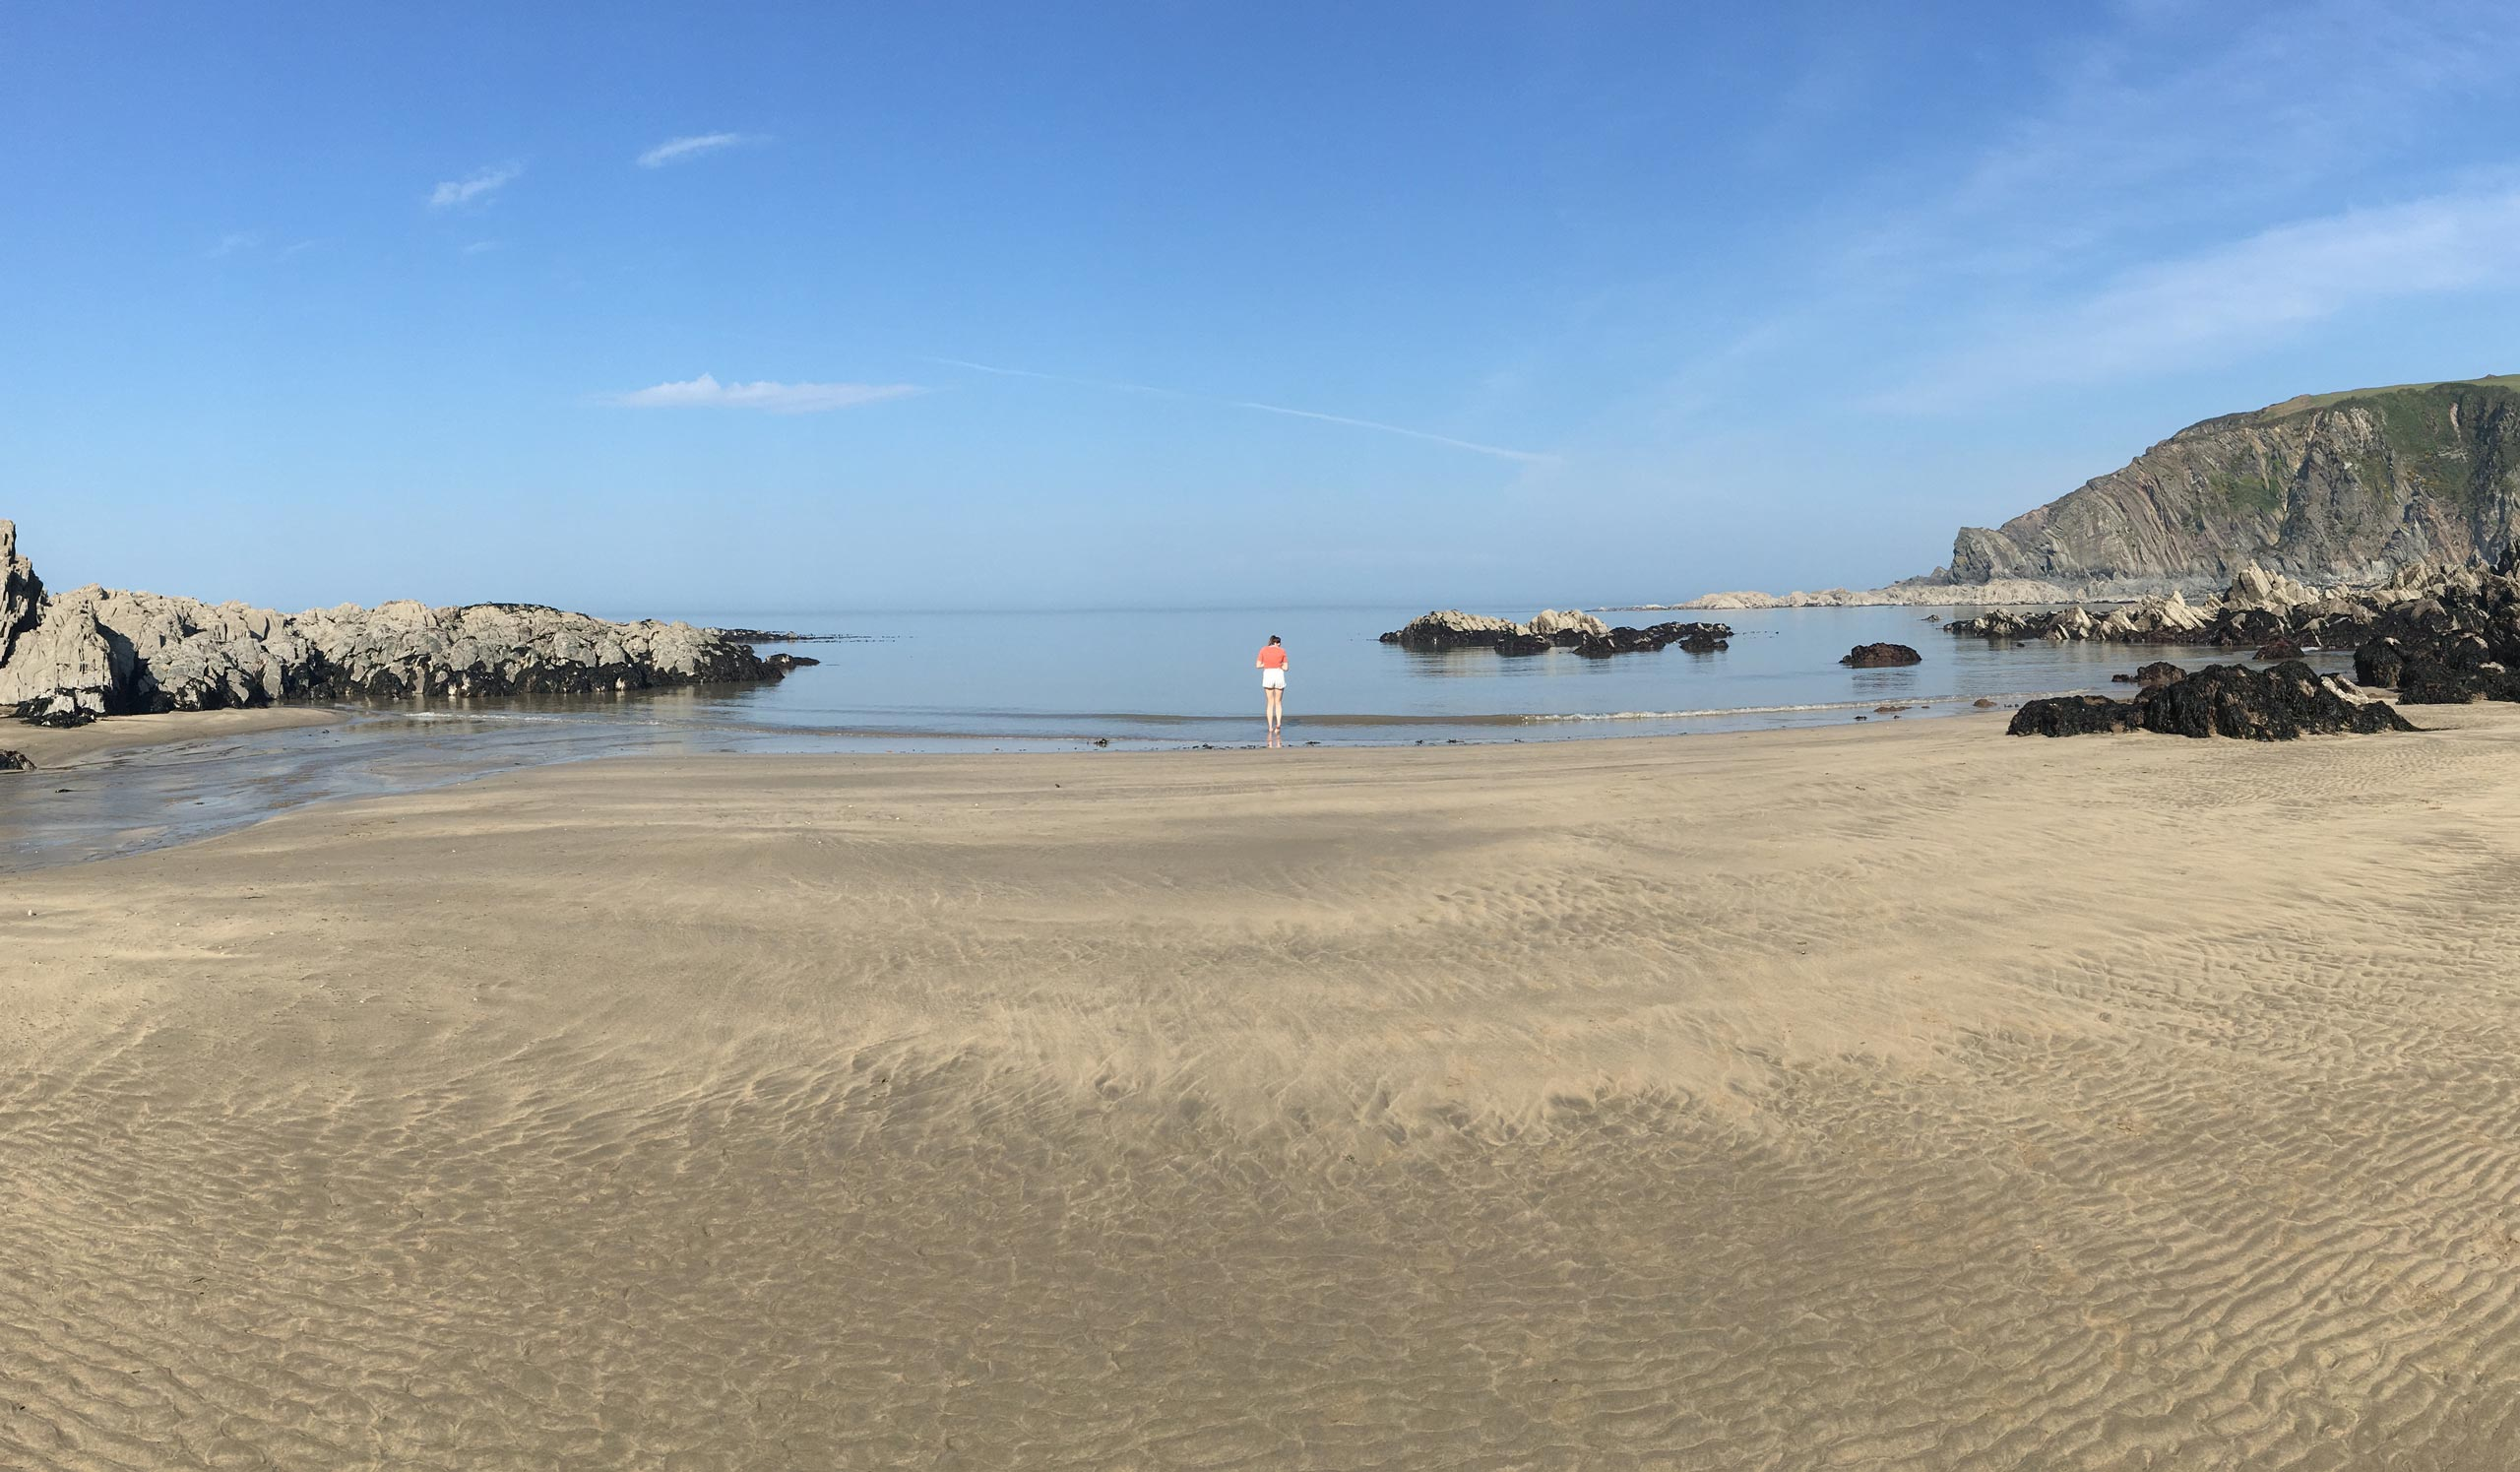 Lee bay beach with jess